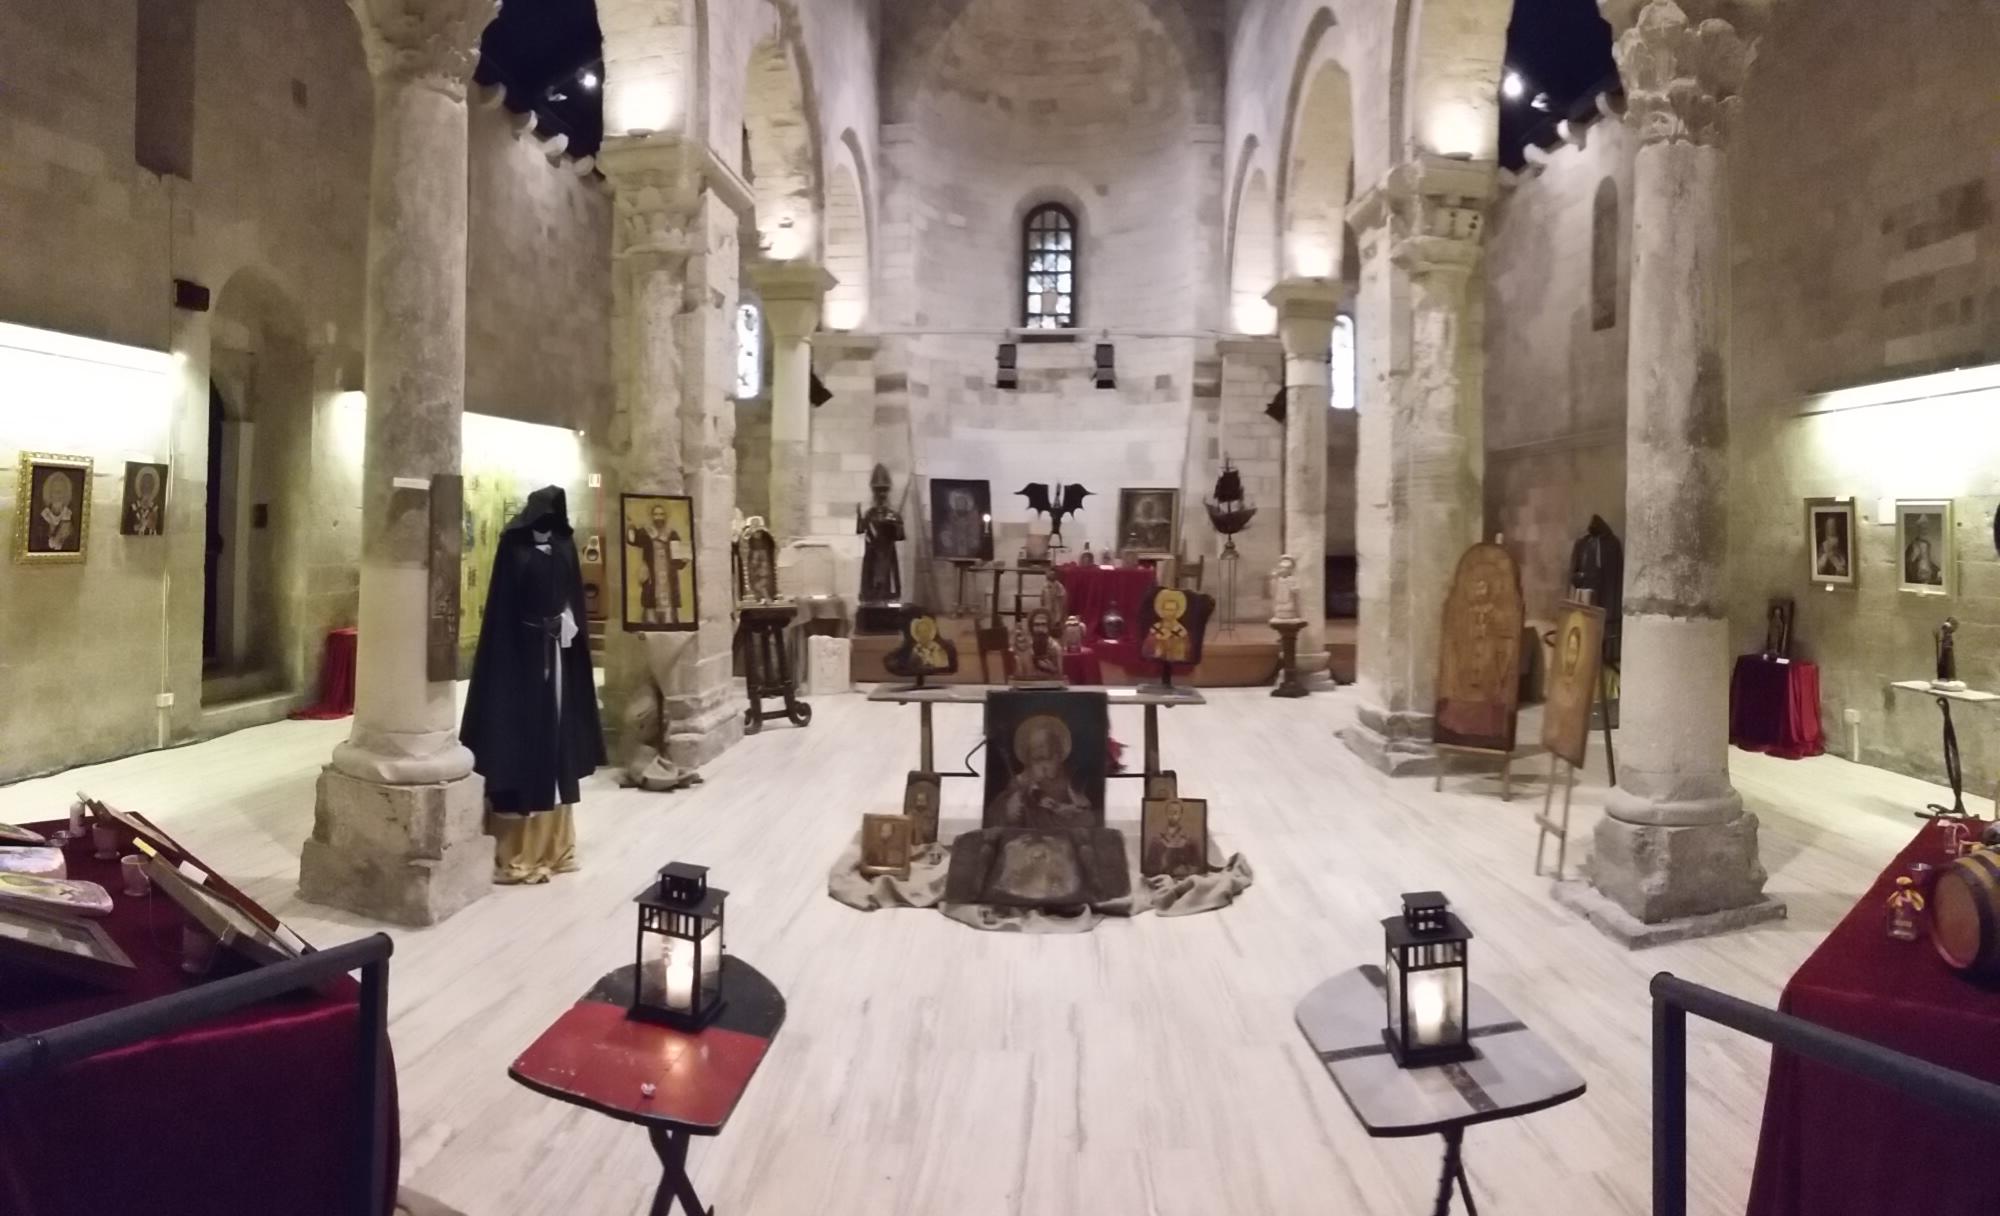 Mostra San Nicola nel medioevo Bari